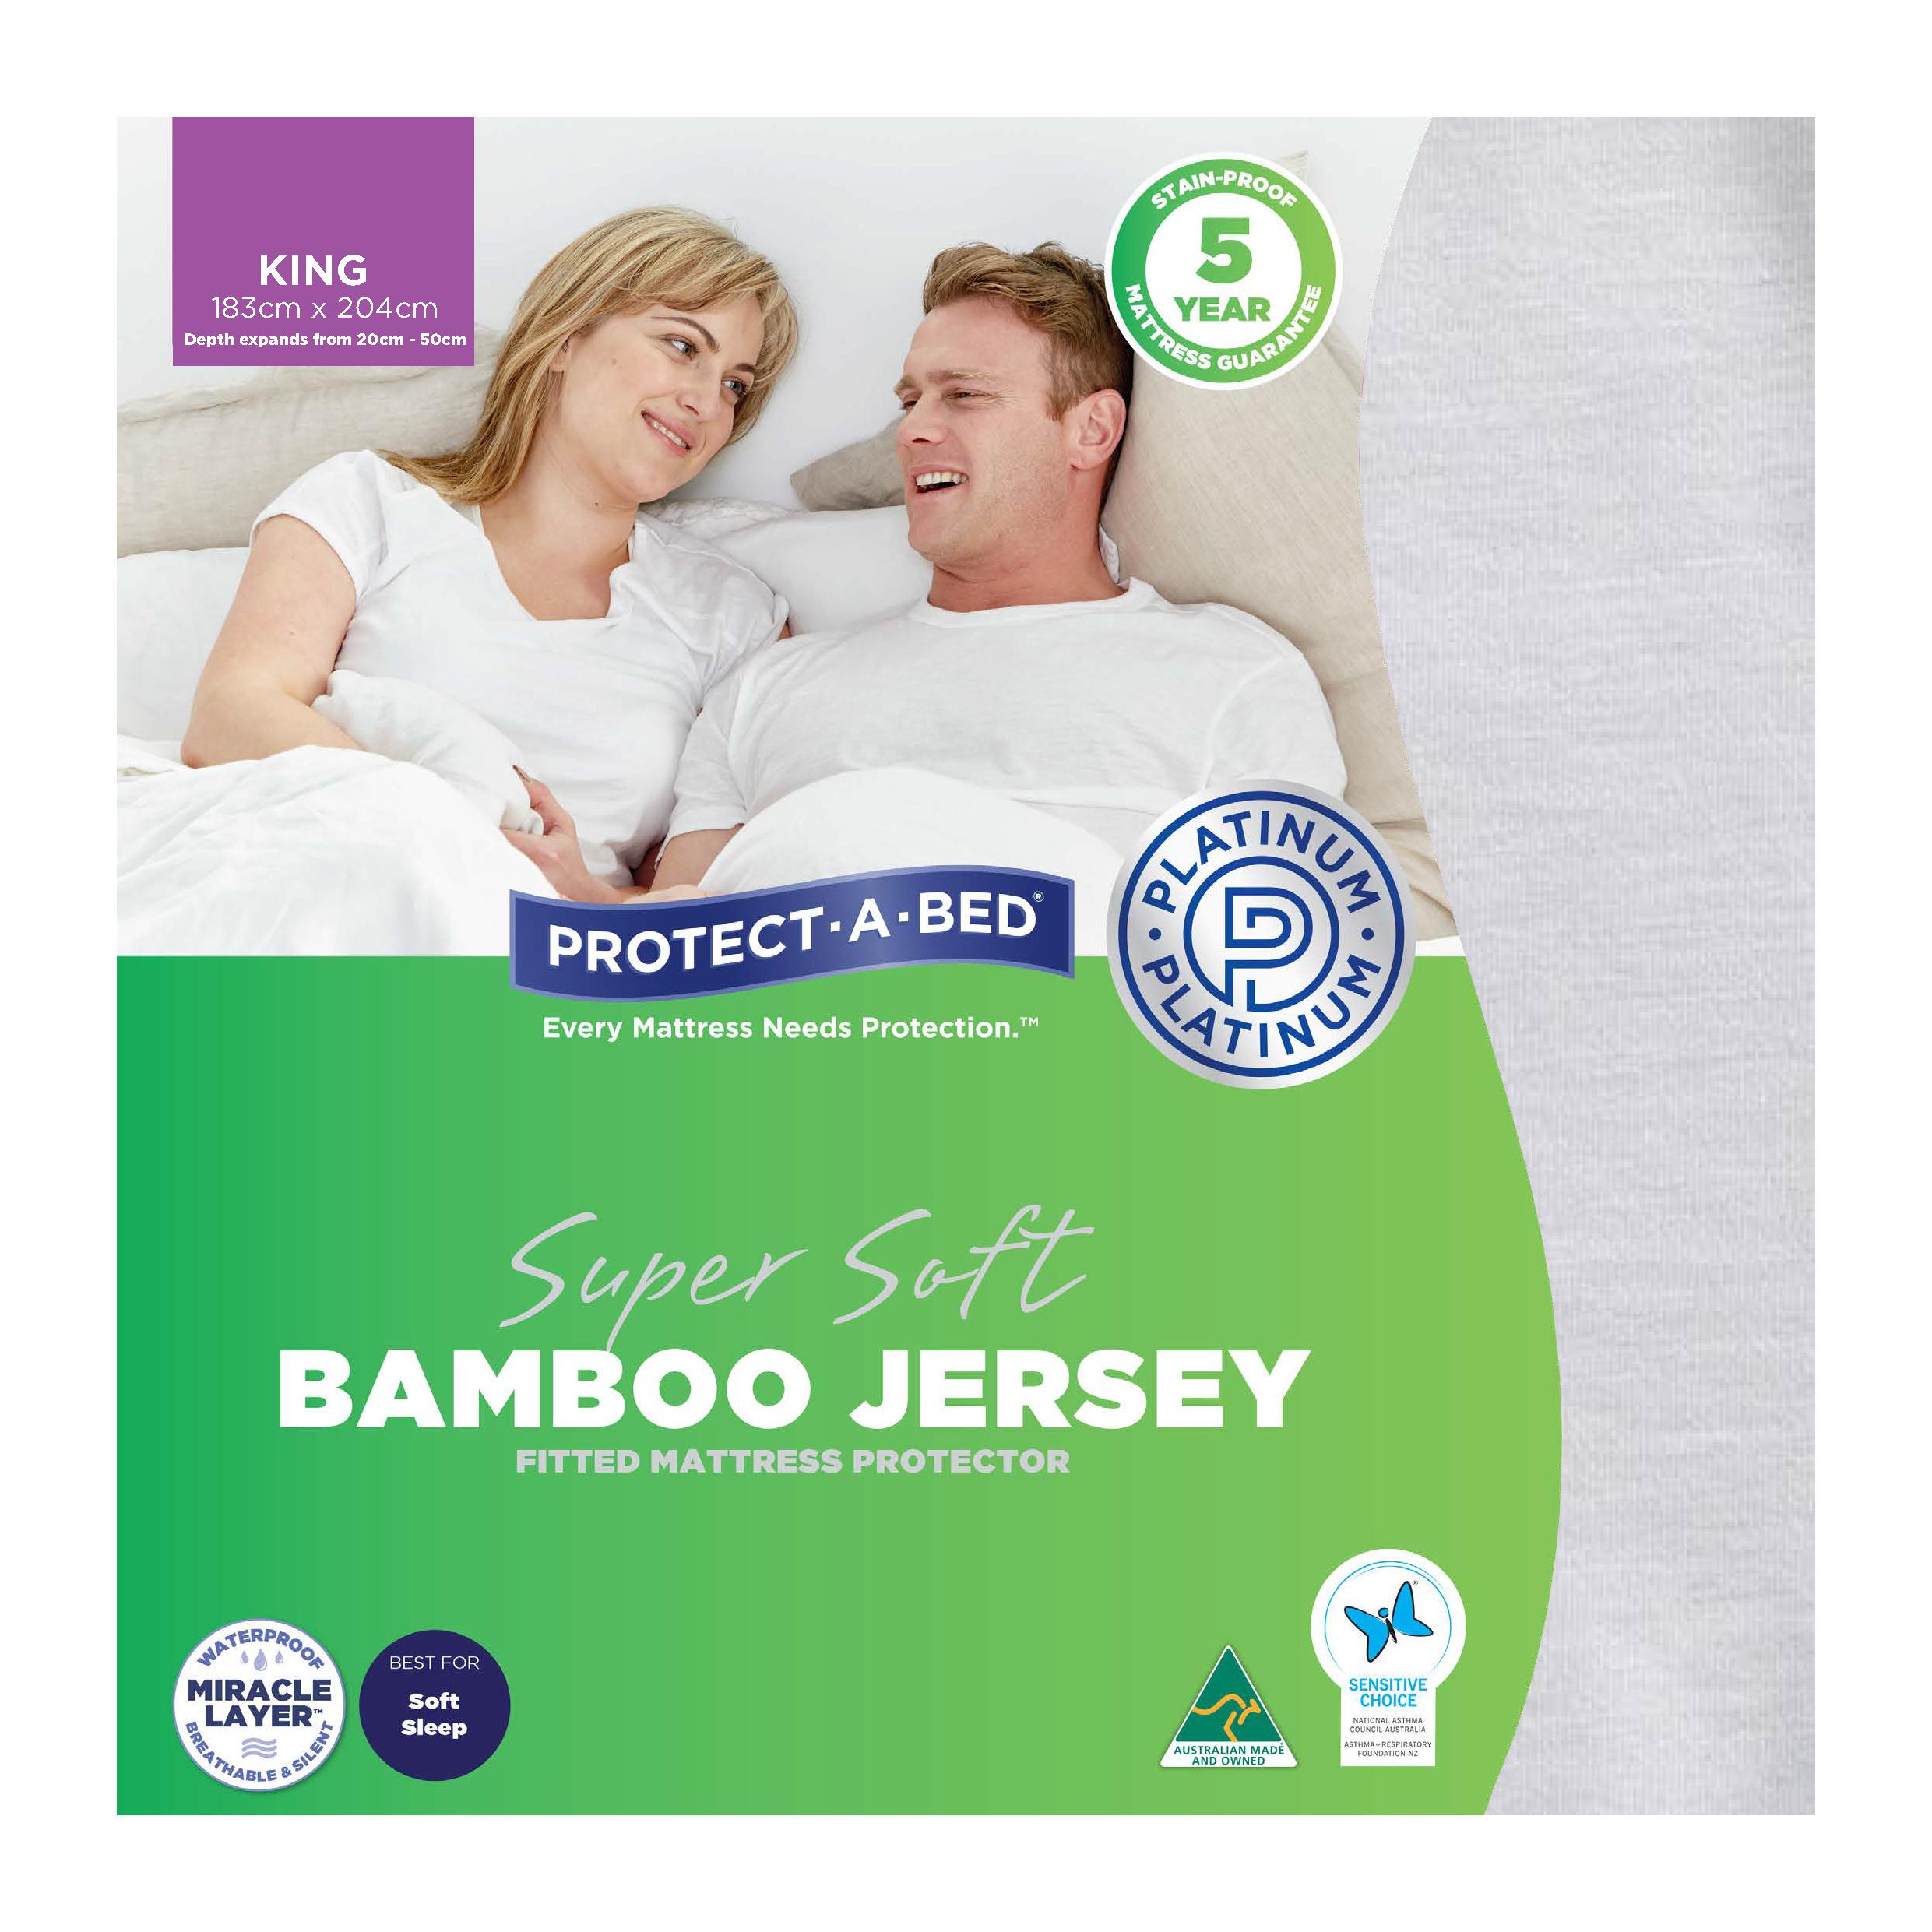 Protect-A-Bed Bamboo Jersey – King Mattress Protector